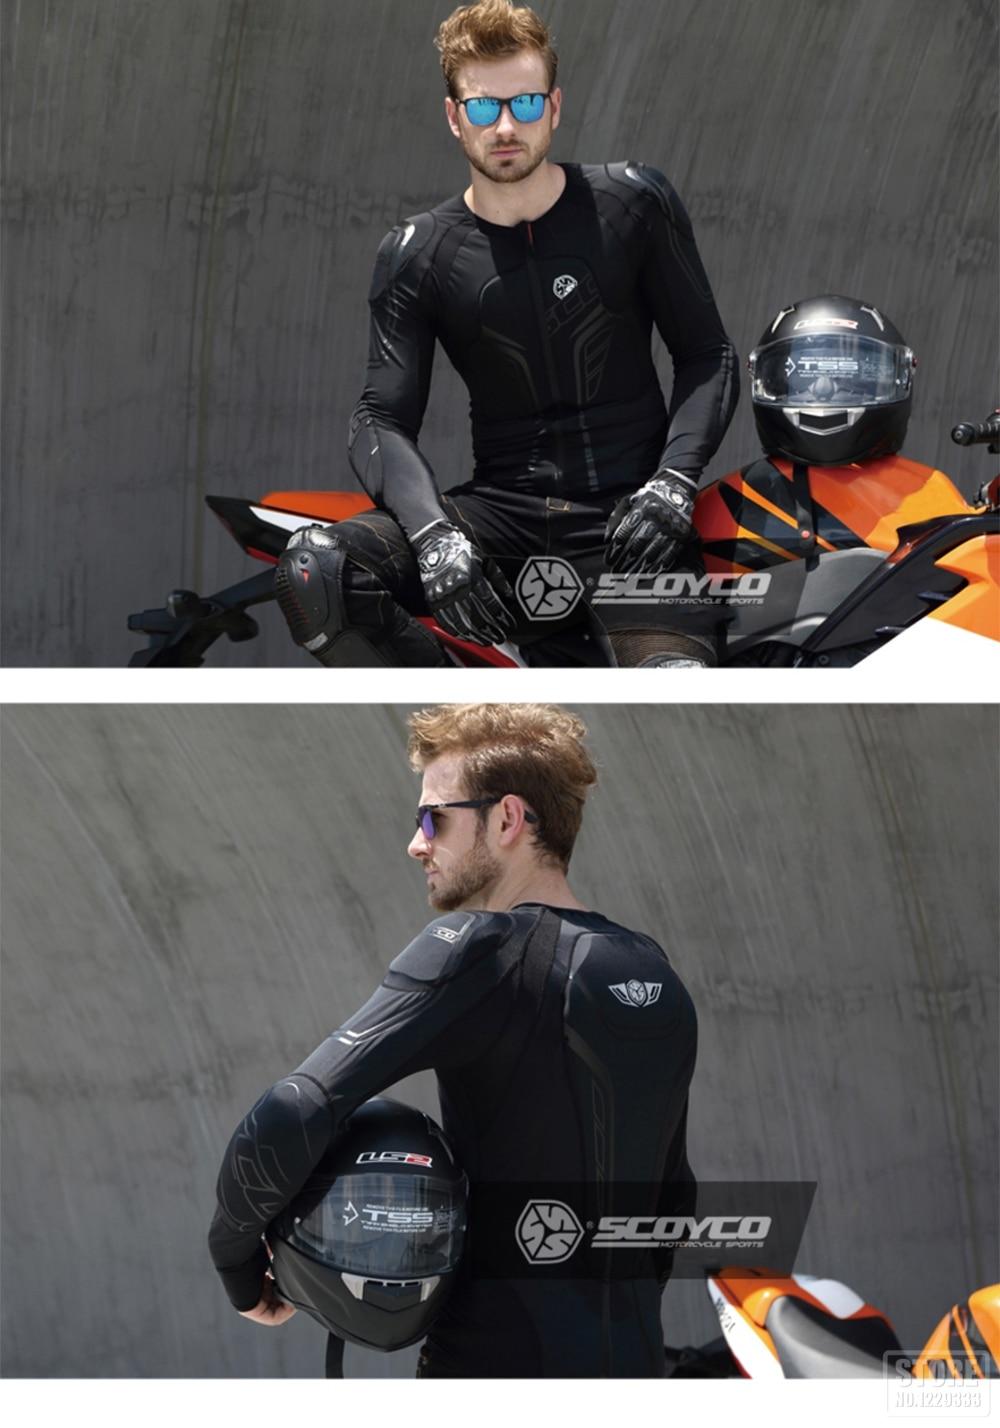 In Design; Moto Rcycle Rüstung Jacken Volle Körper Schutz Kleidung Protector Moto Jacke Kreuz Rüstung Protector Moto Kreuz Körper Rüstung Maske Novel